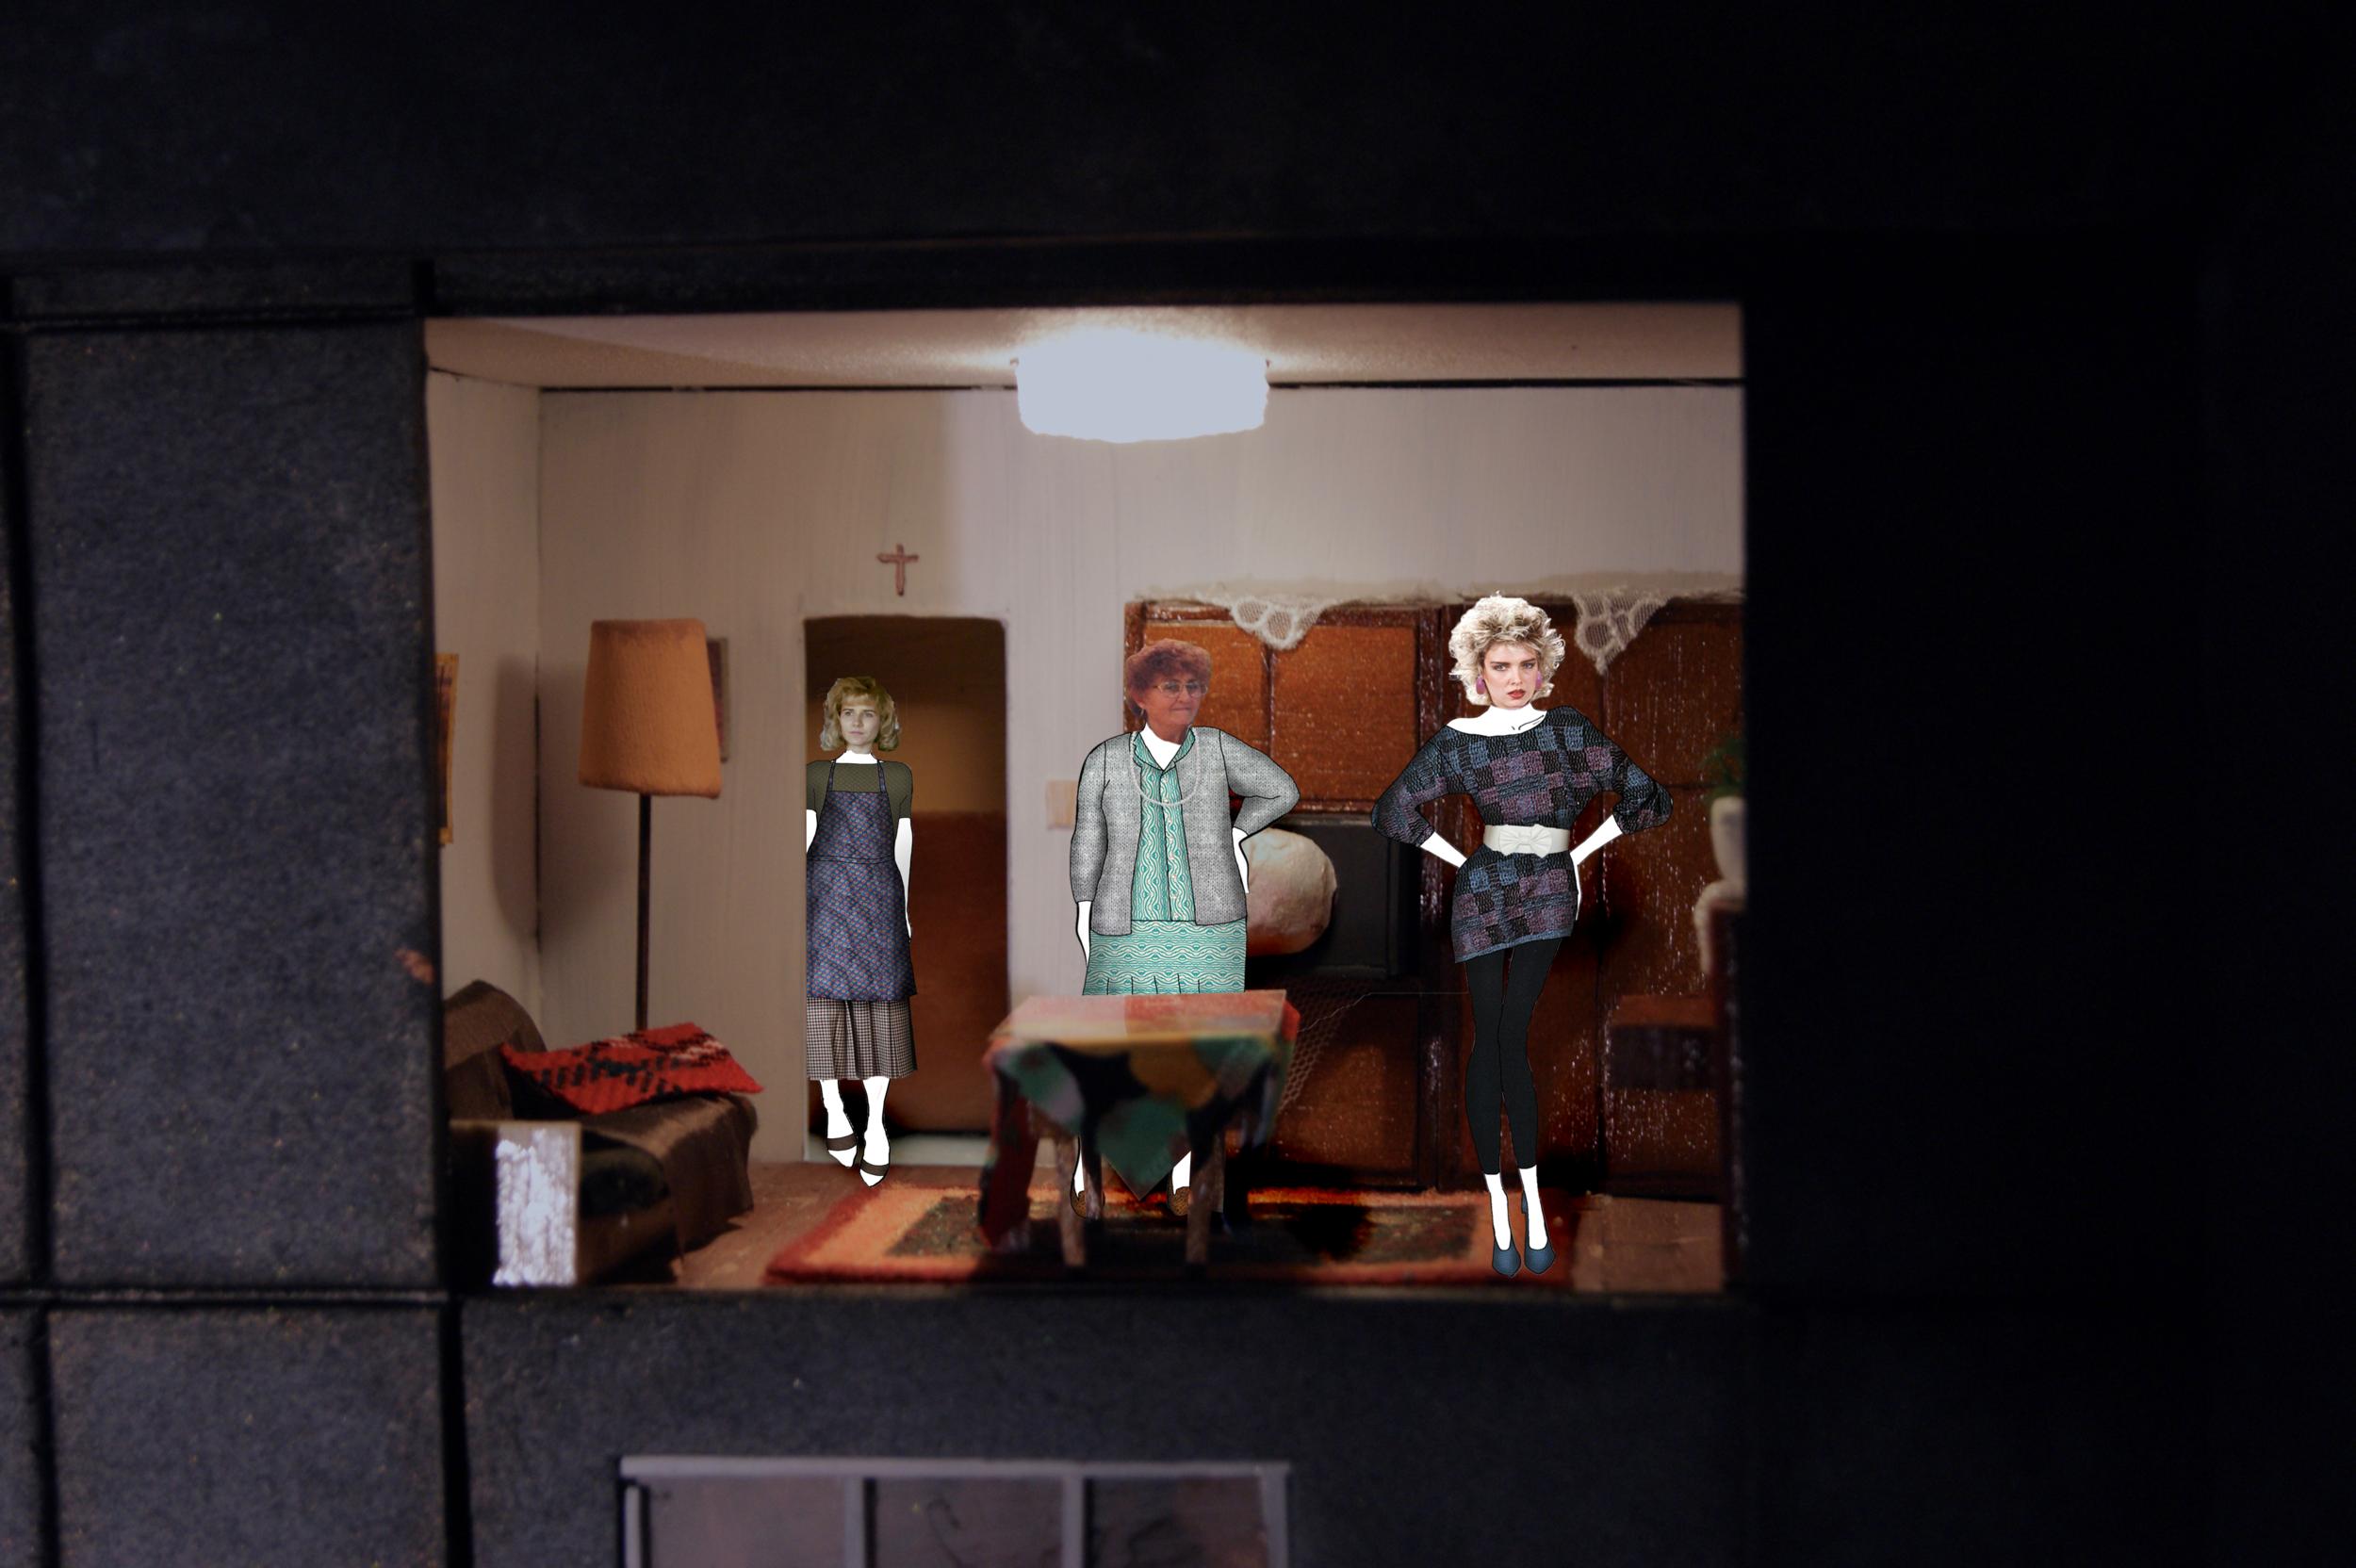 scene 4 - home